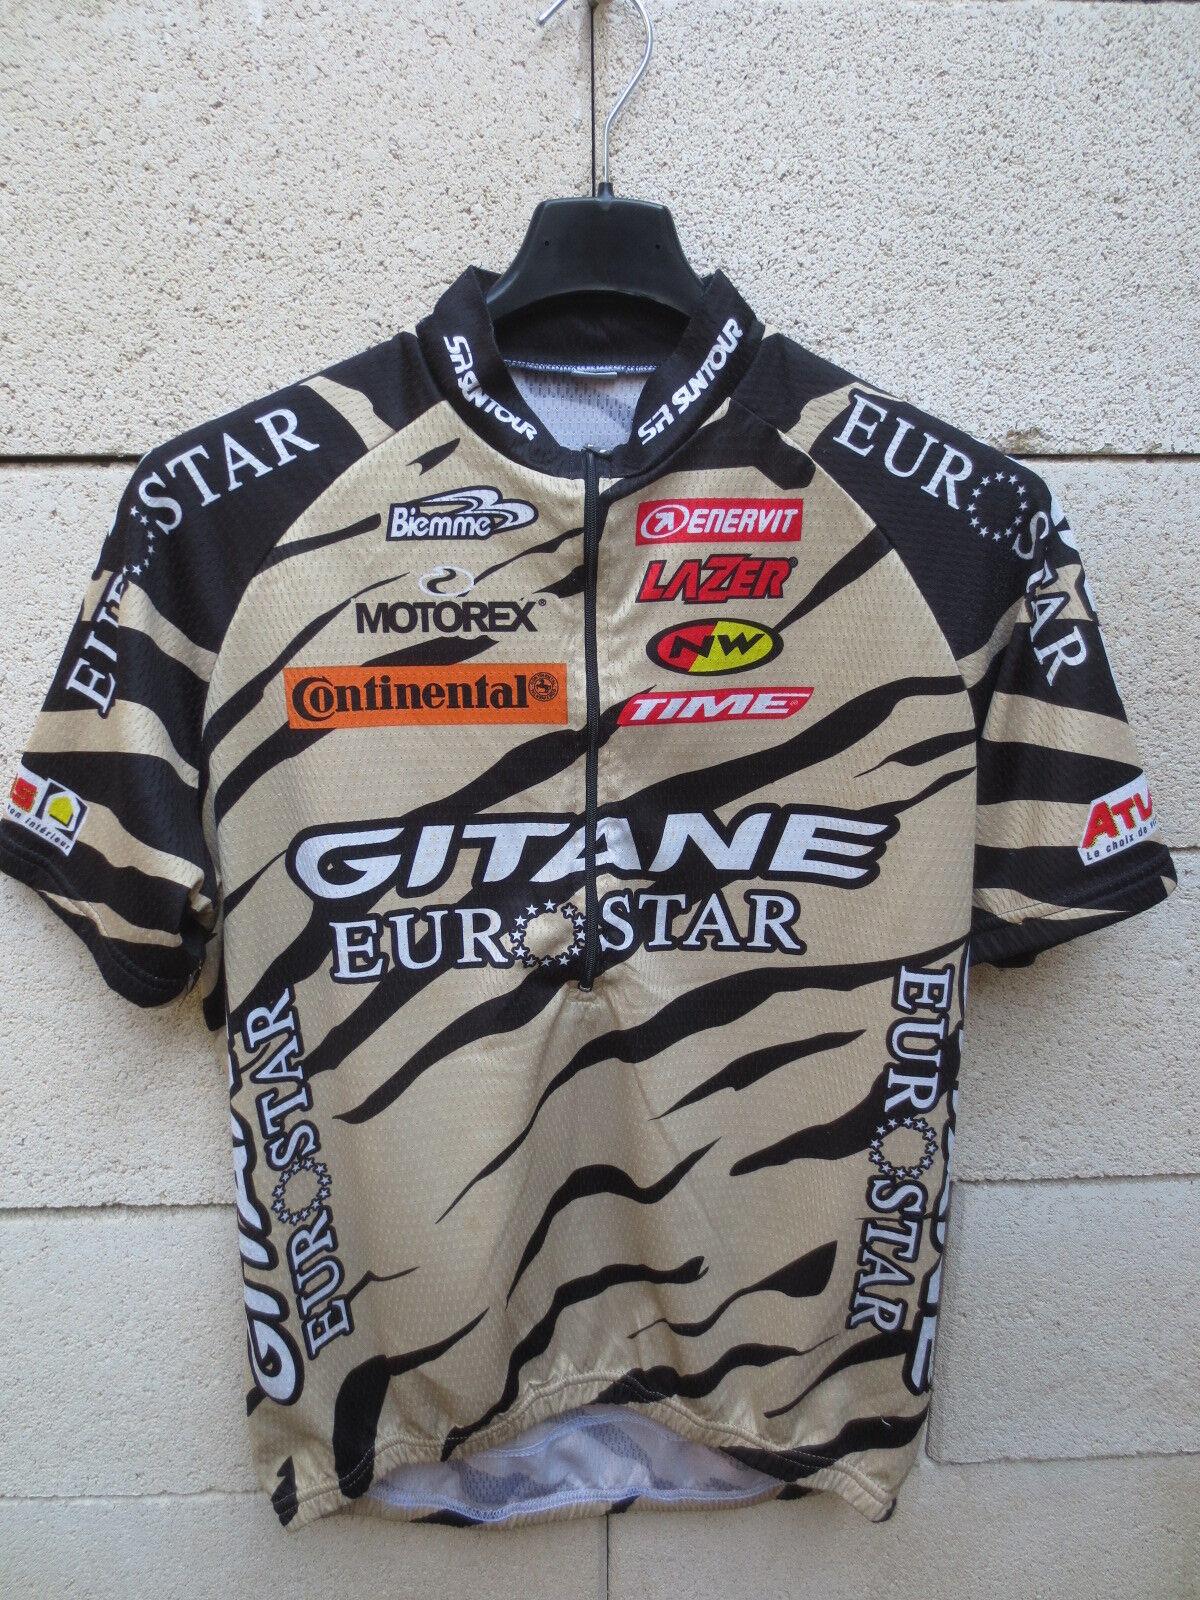 Maillot cycliste GITANE EUROSTAR Biemme cyling jersey shirt M maglia camiseta